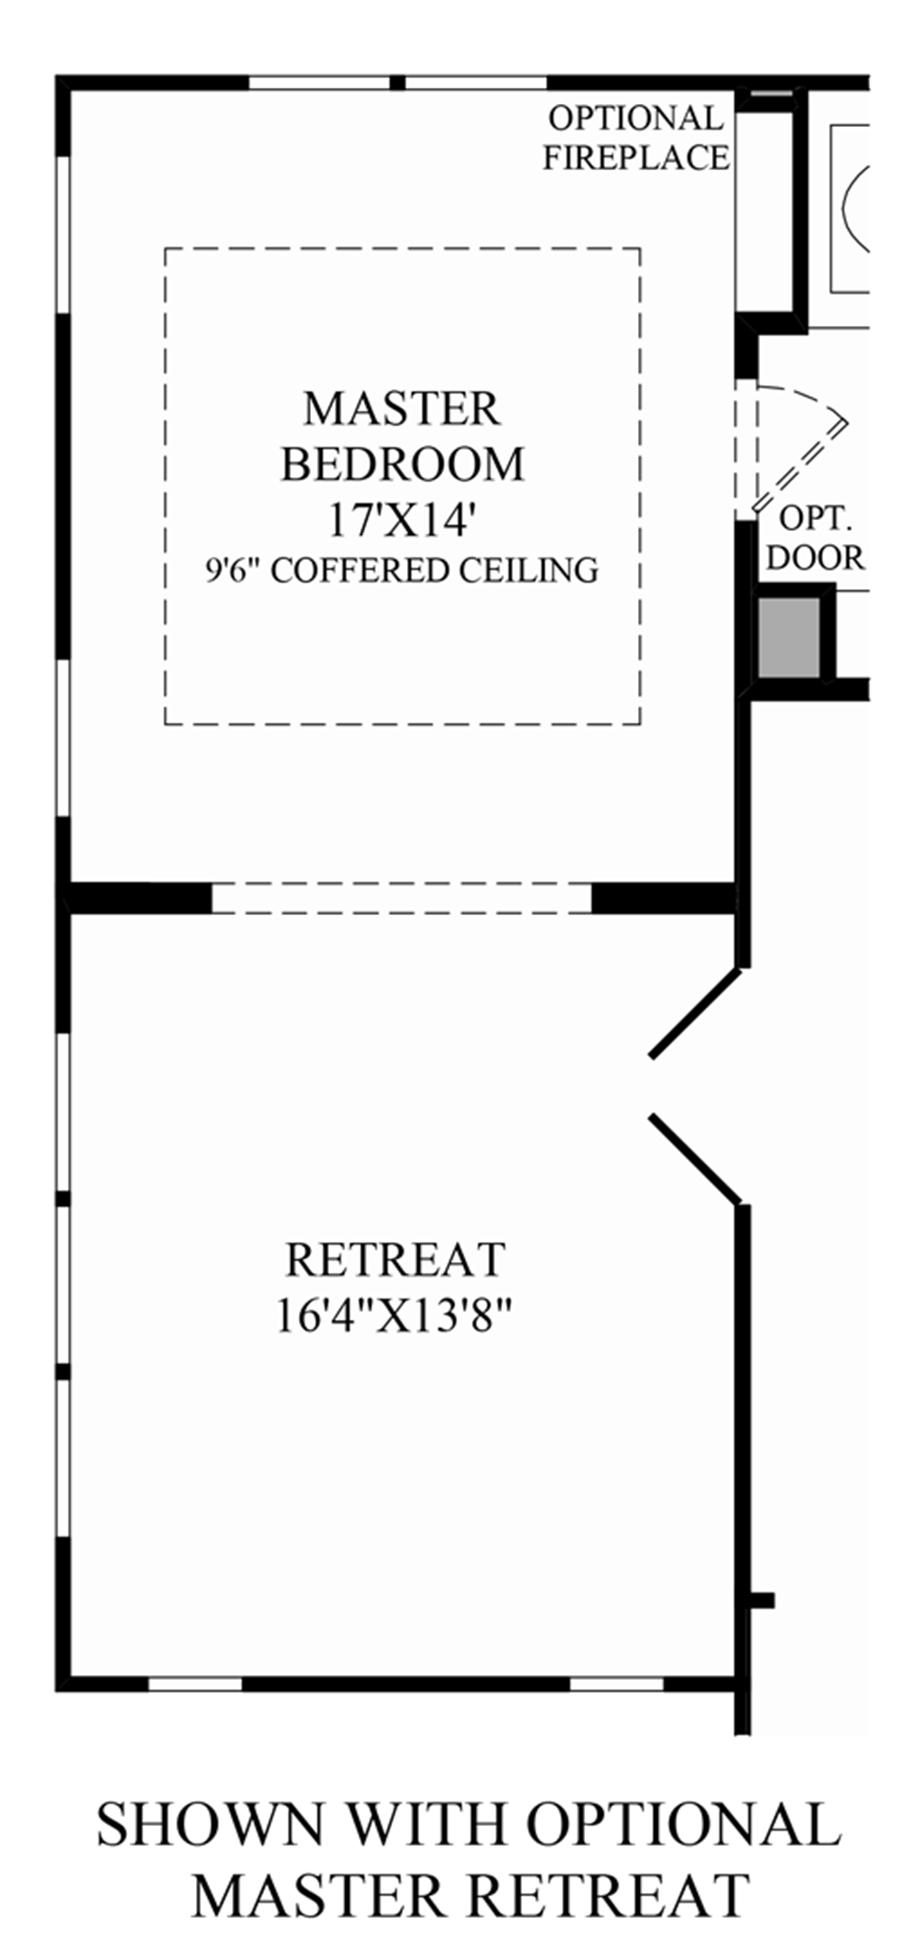 Highlands east at baker ranch the ridgecrest home design for Master retreat floor plans